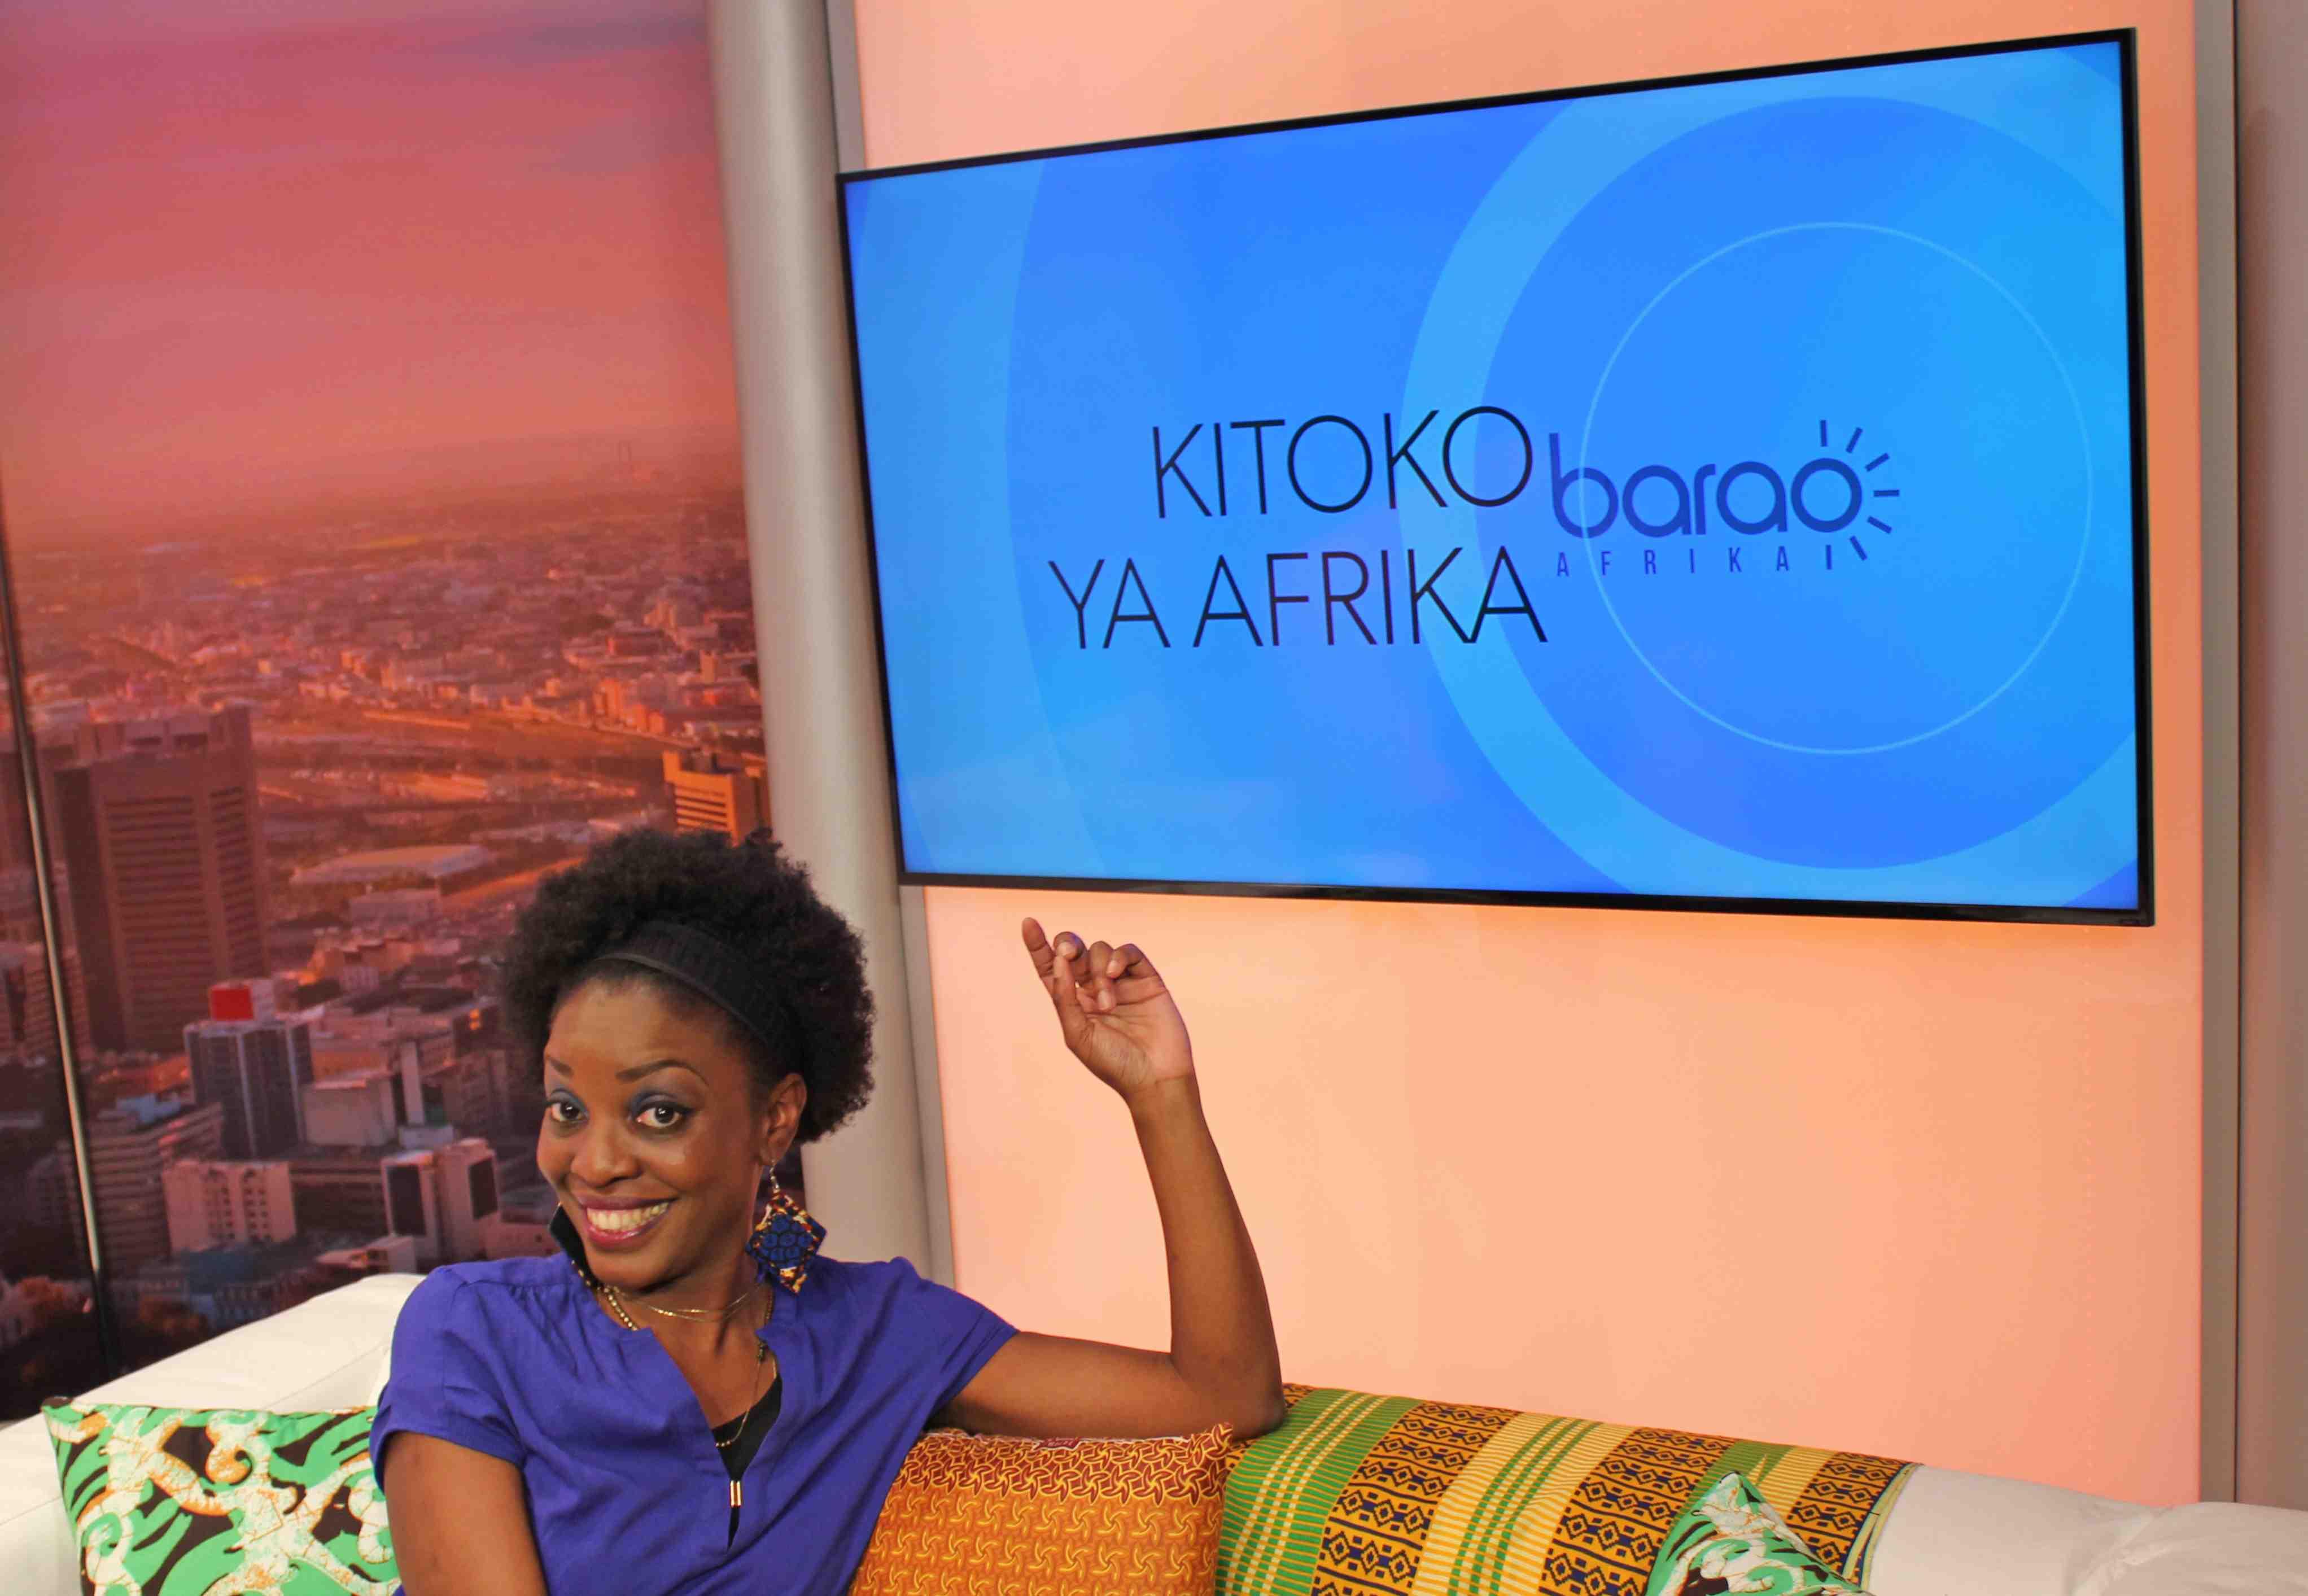 kitoko ya afrika vox africa barao afrika retour naturel